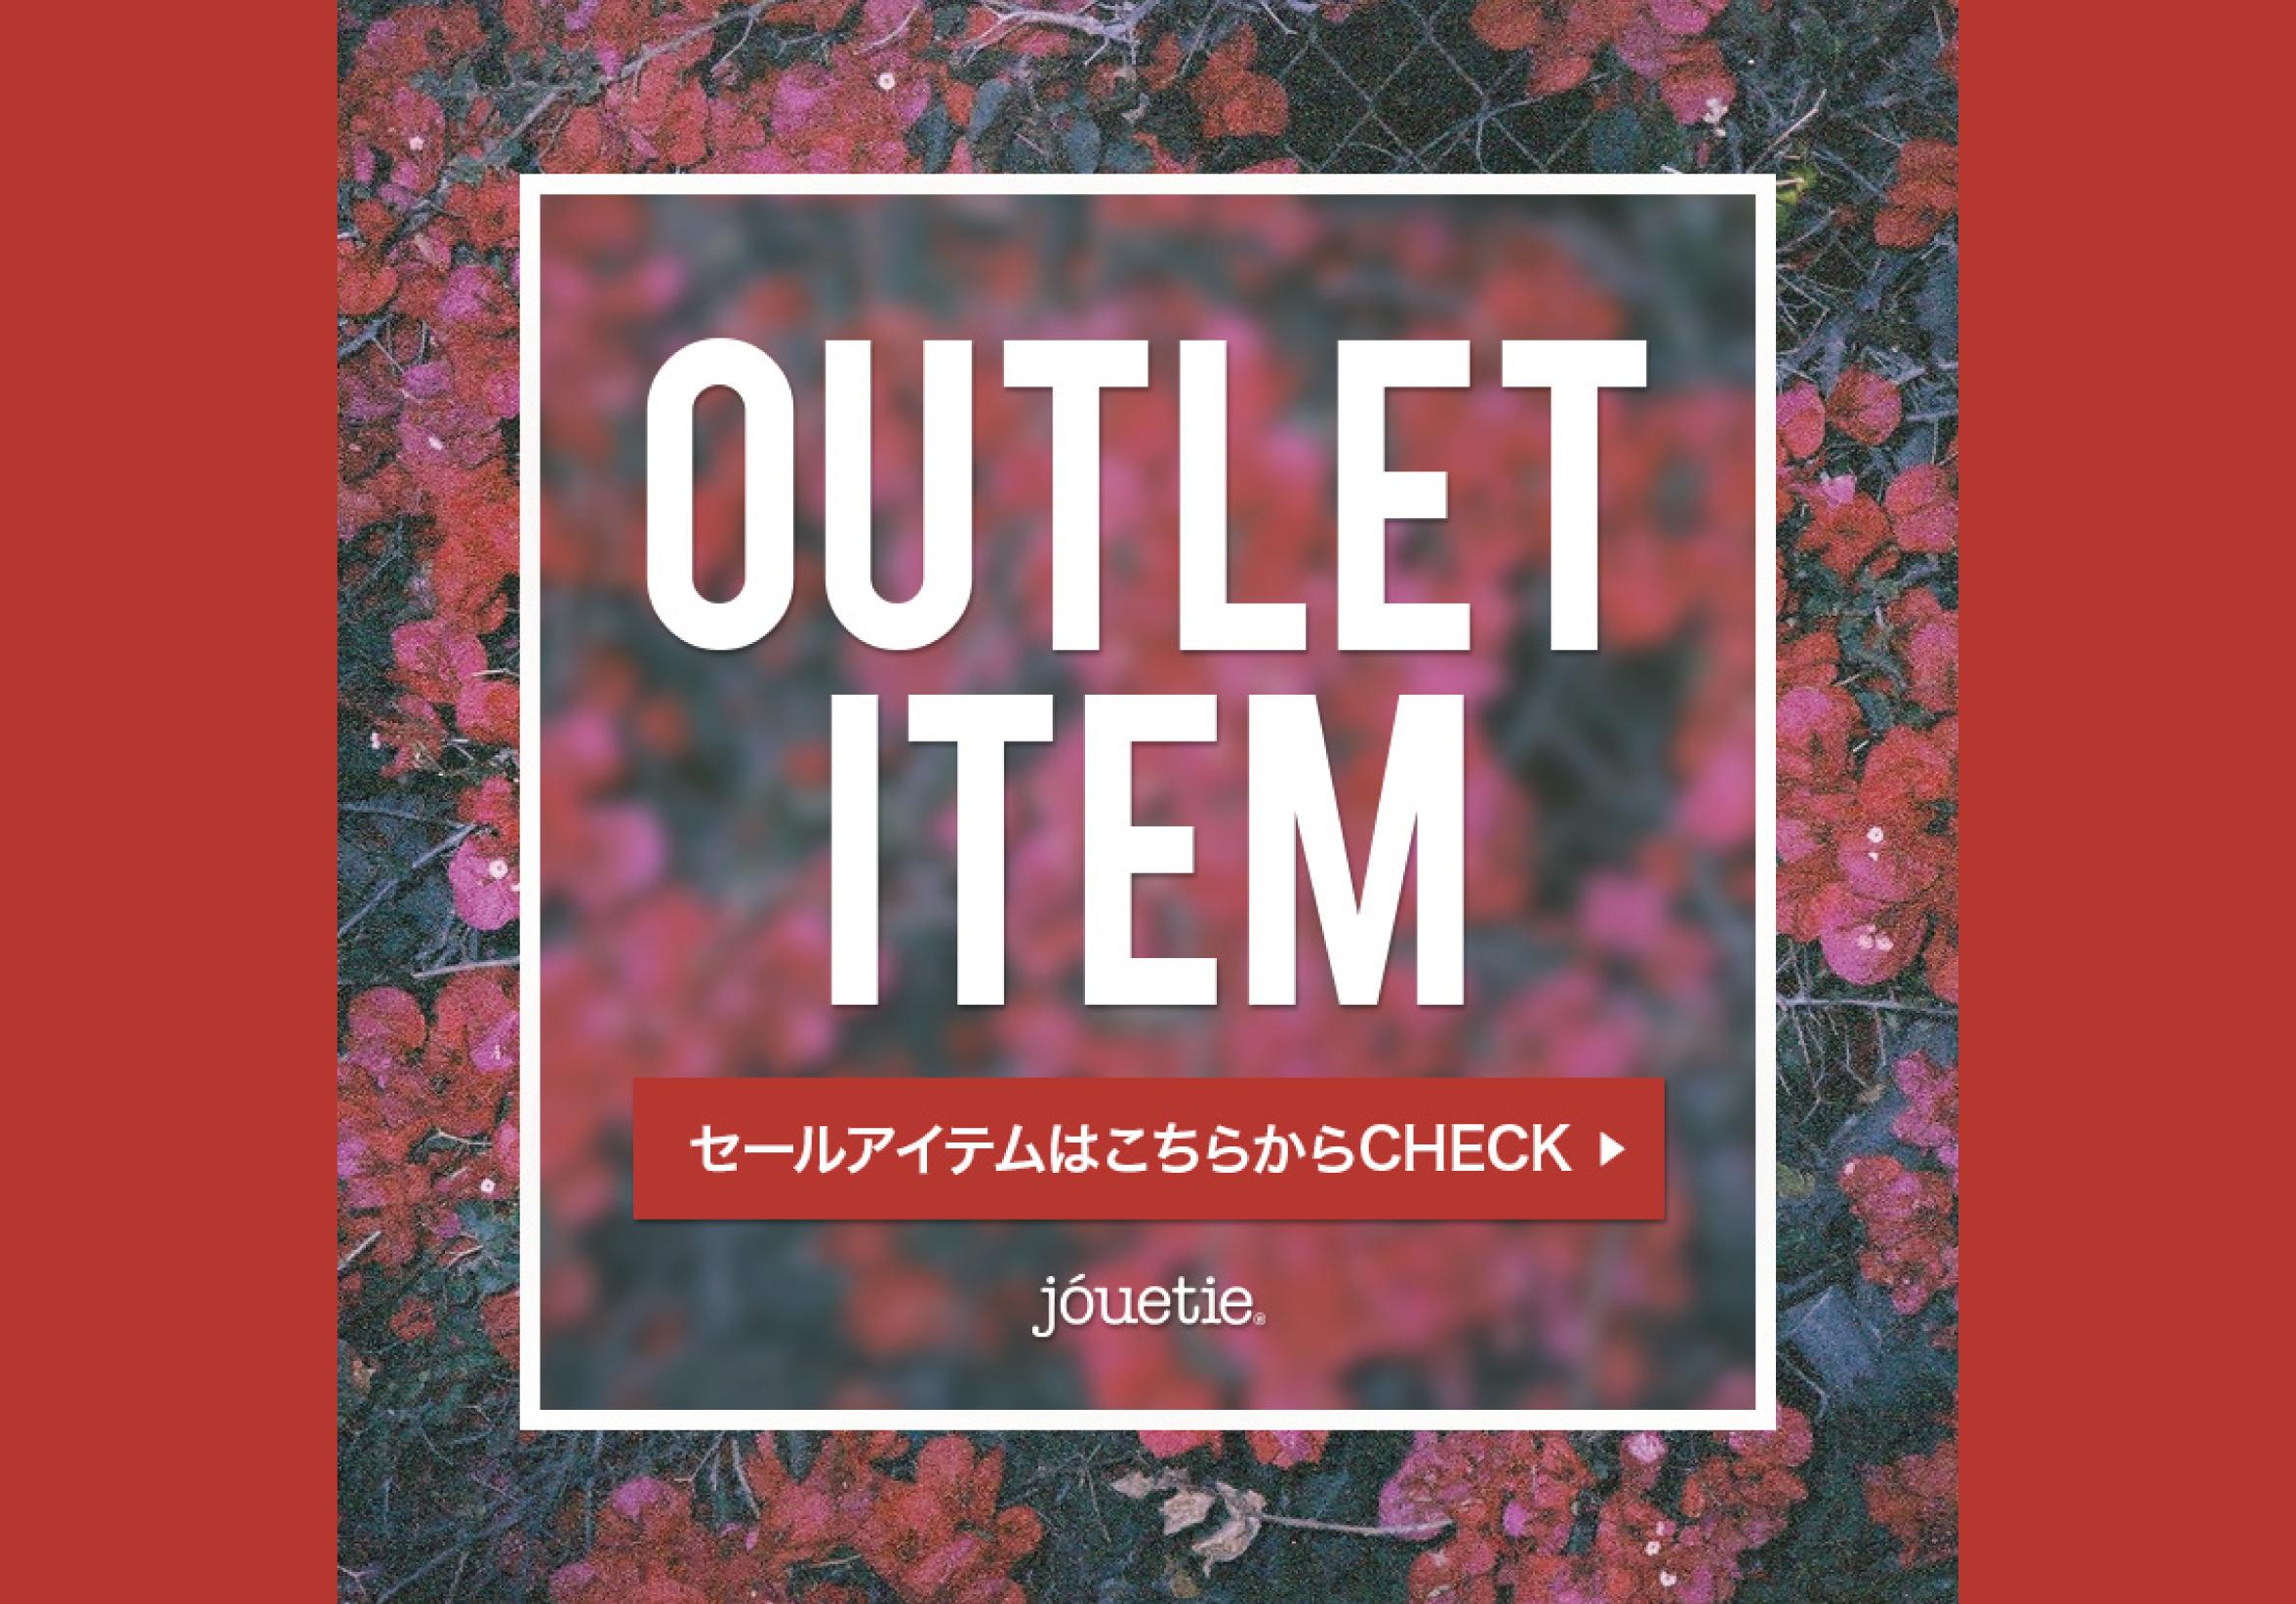 【jouetie OUTLET ITEM】